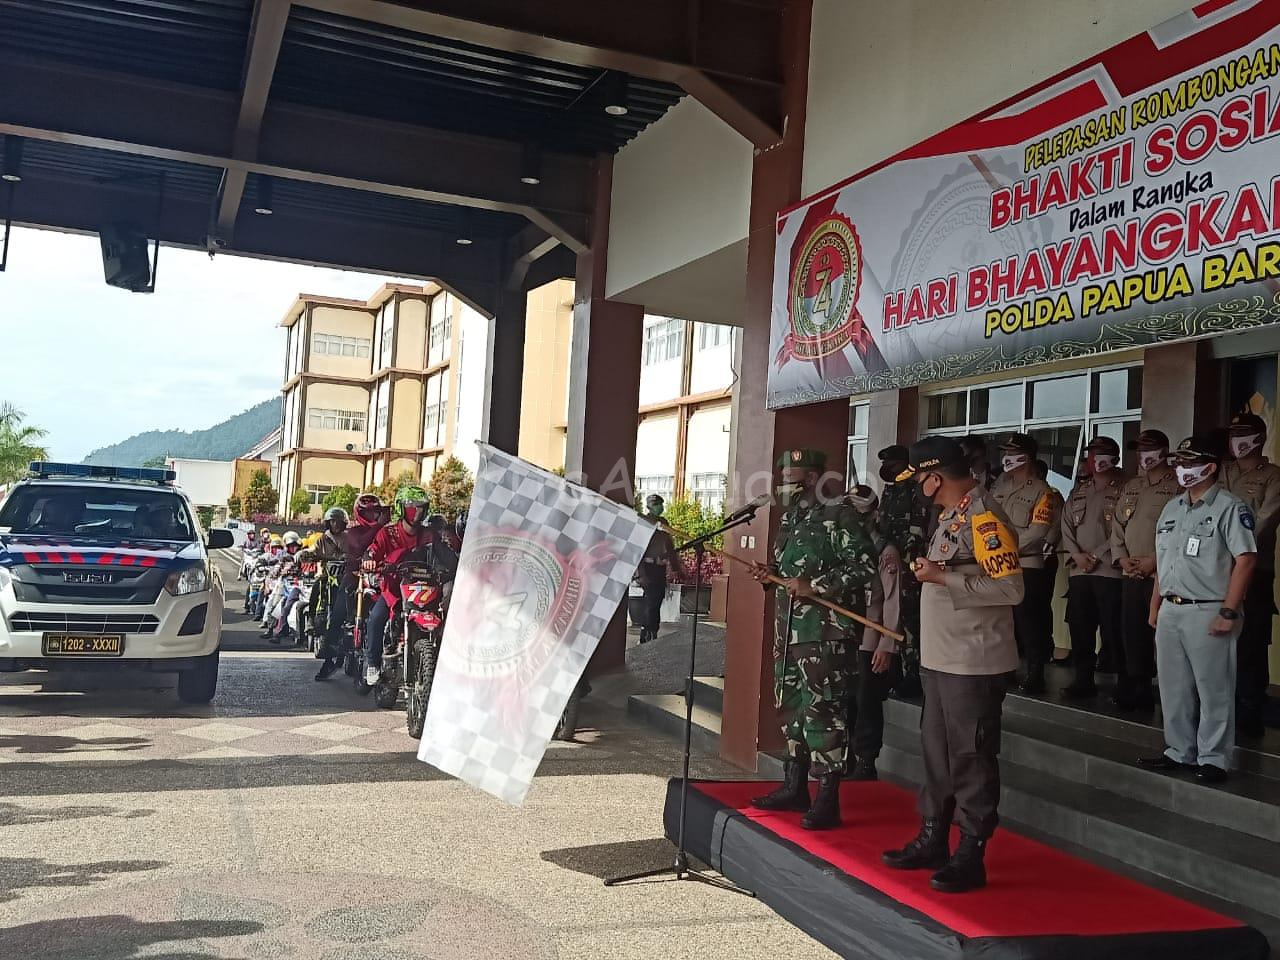 Polda Papua Barat Bagi Sembako Untuk TKBM, Ojek Dan Tenaga Medis Manokwari 3 IMG 20200626 WA0023